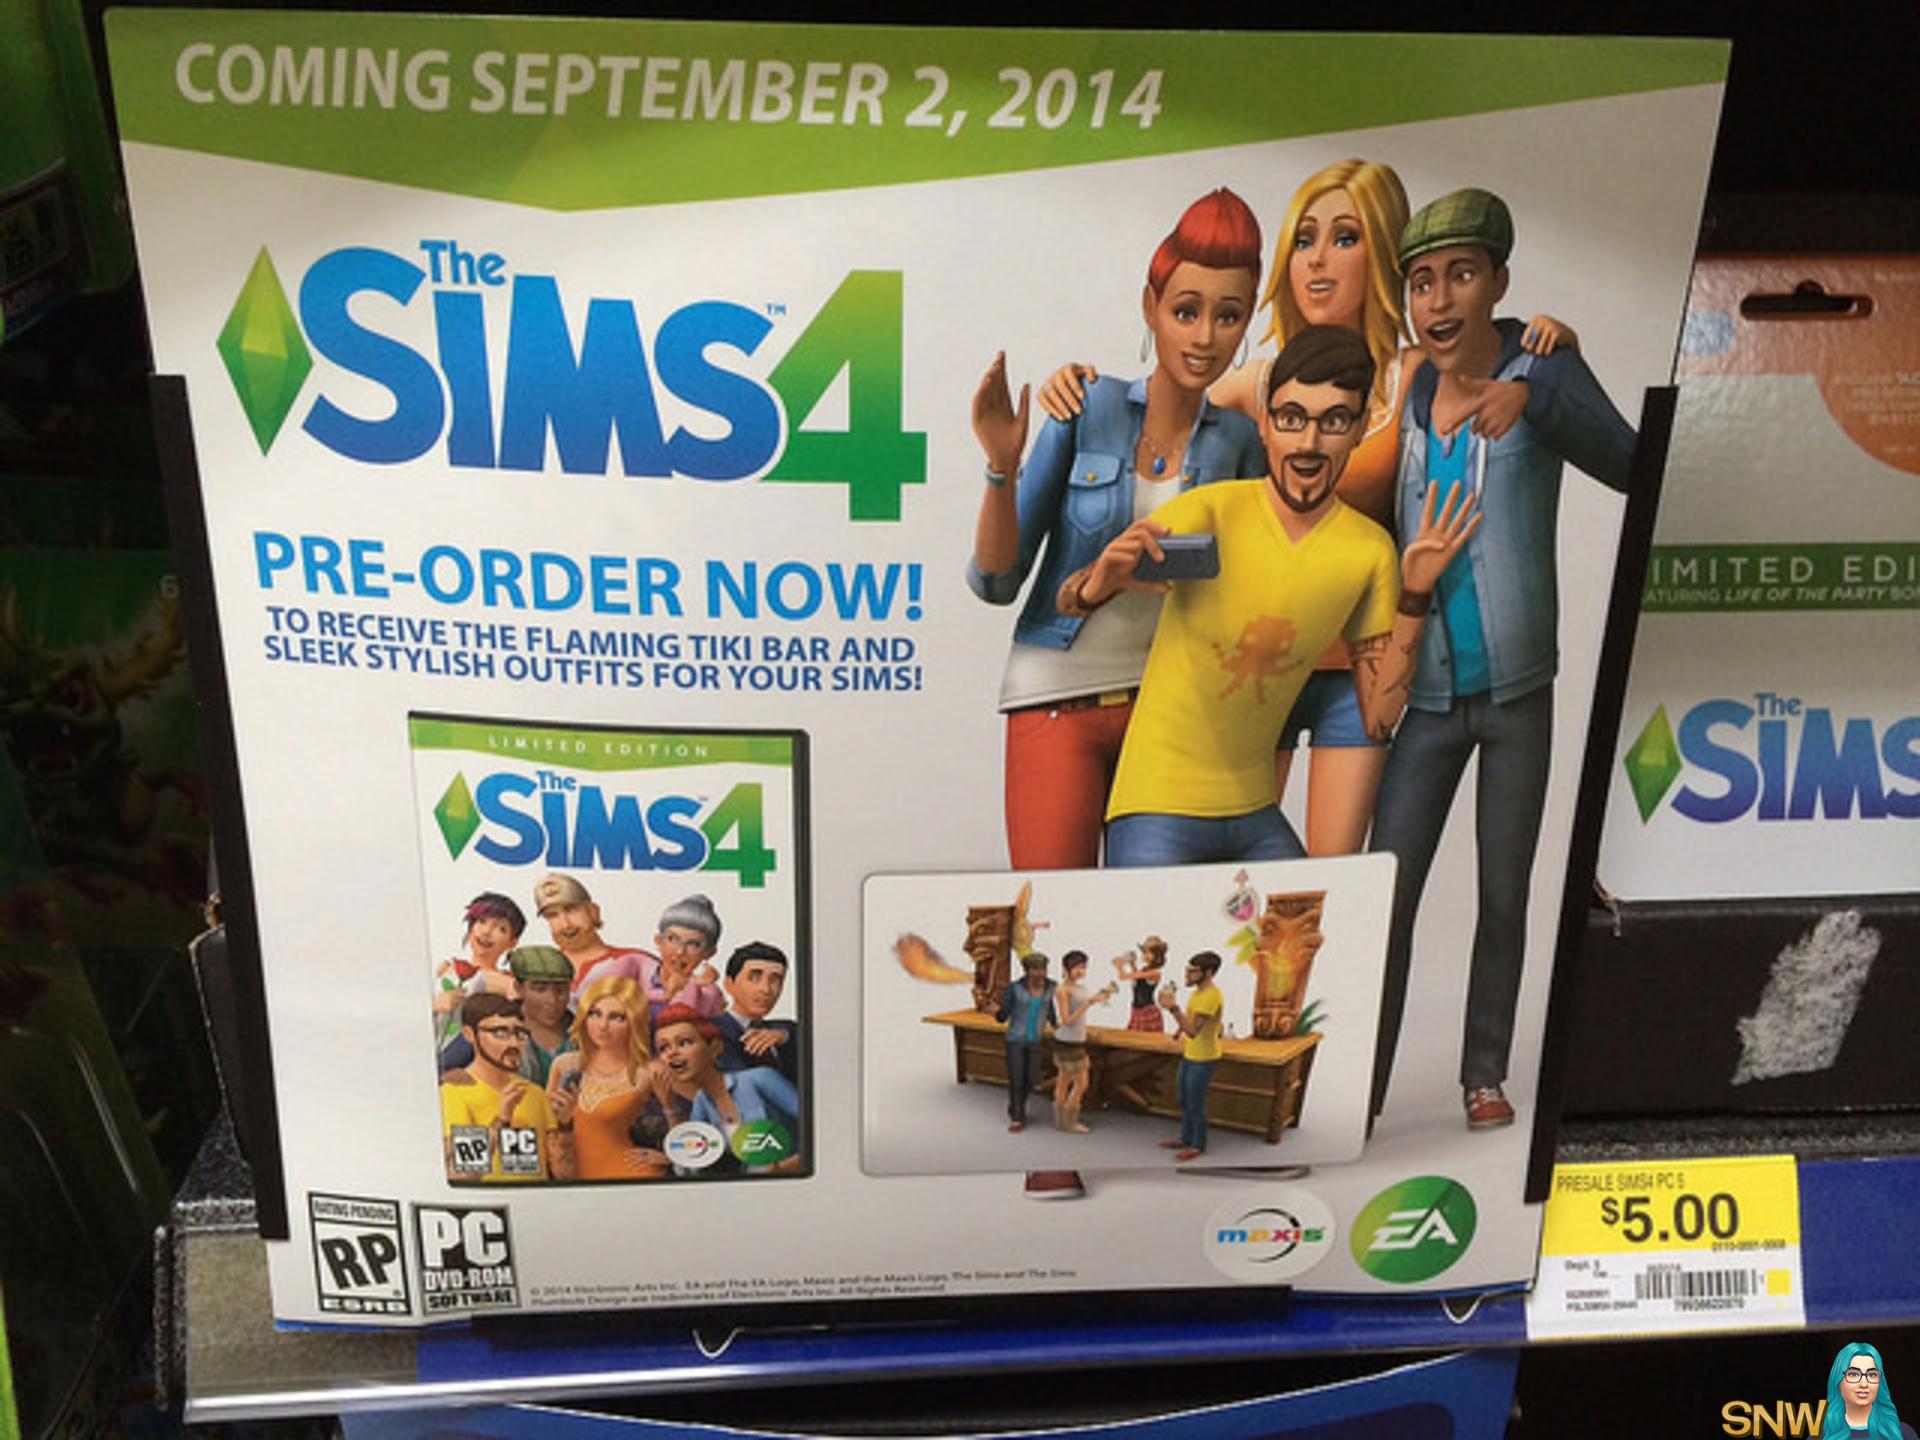 The sims 5 release date in Brisbane